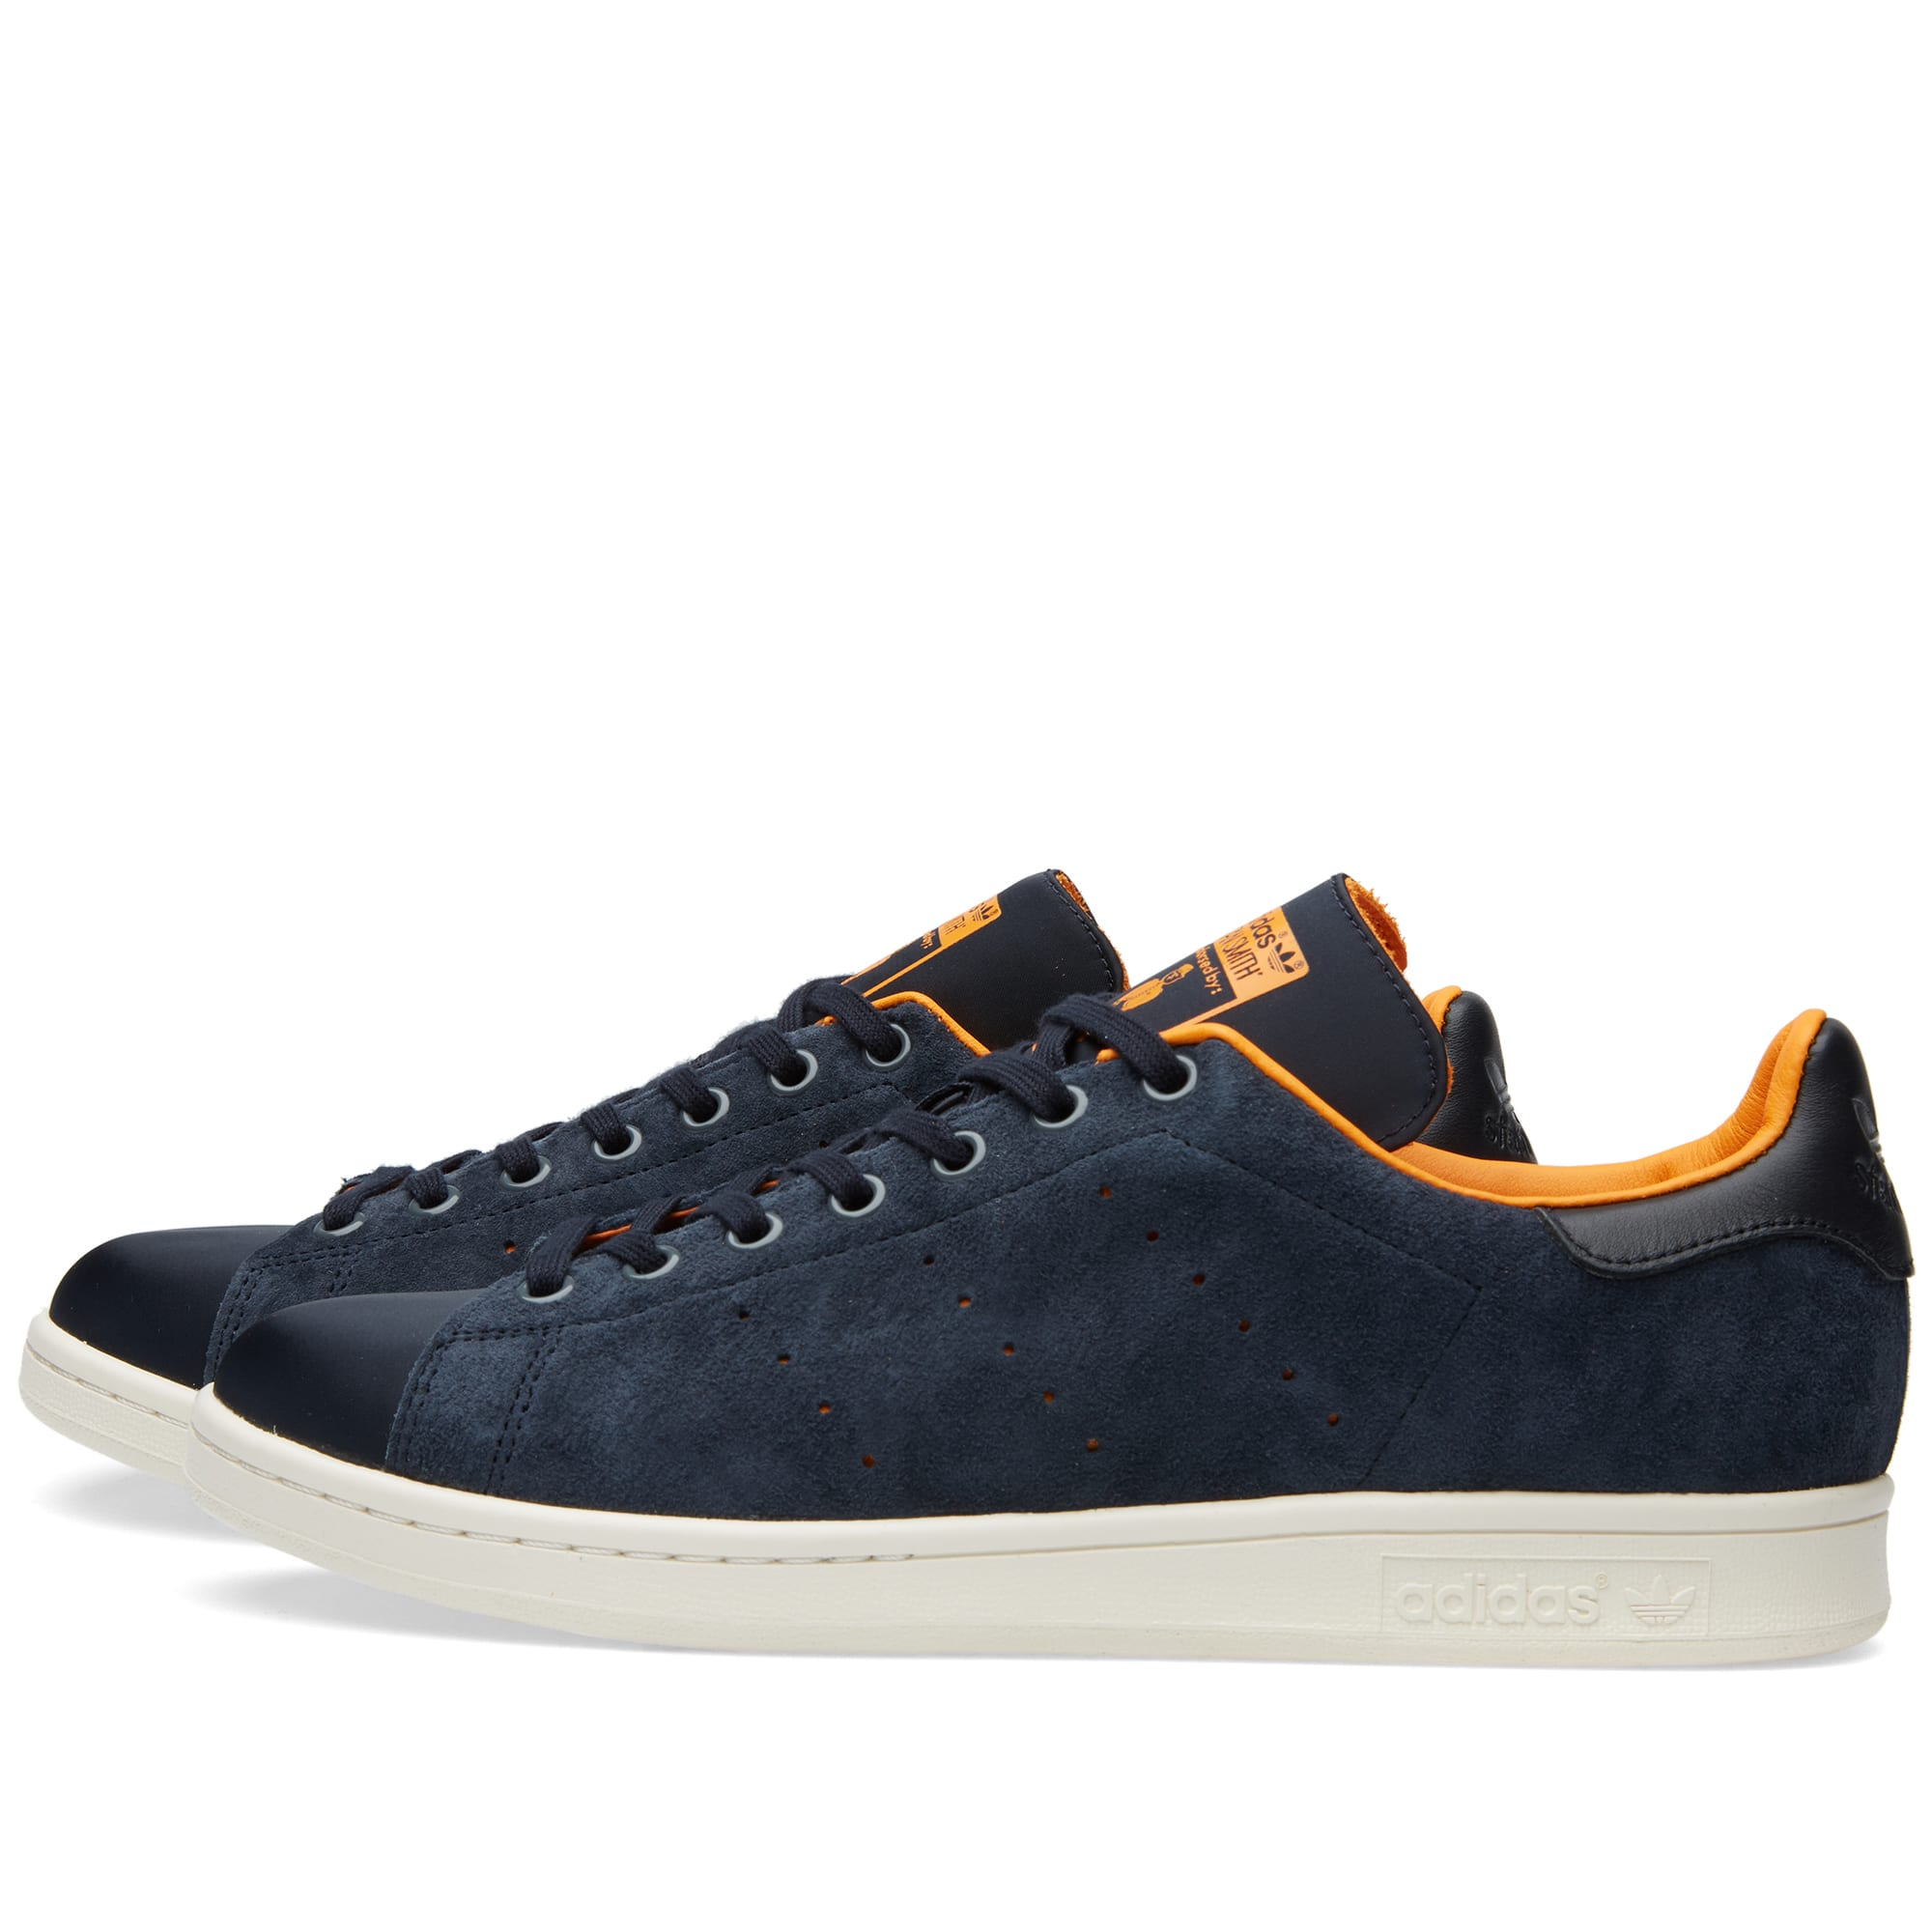 sports shoes 6531f 0acfe Adidas Consortium x Porter Stan Smith